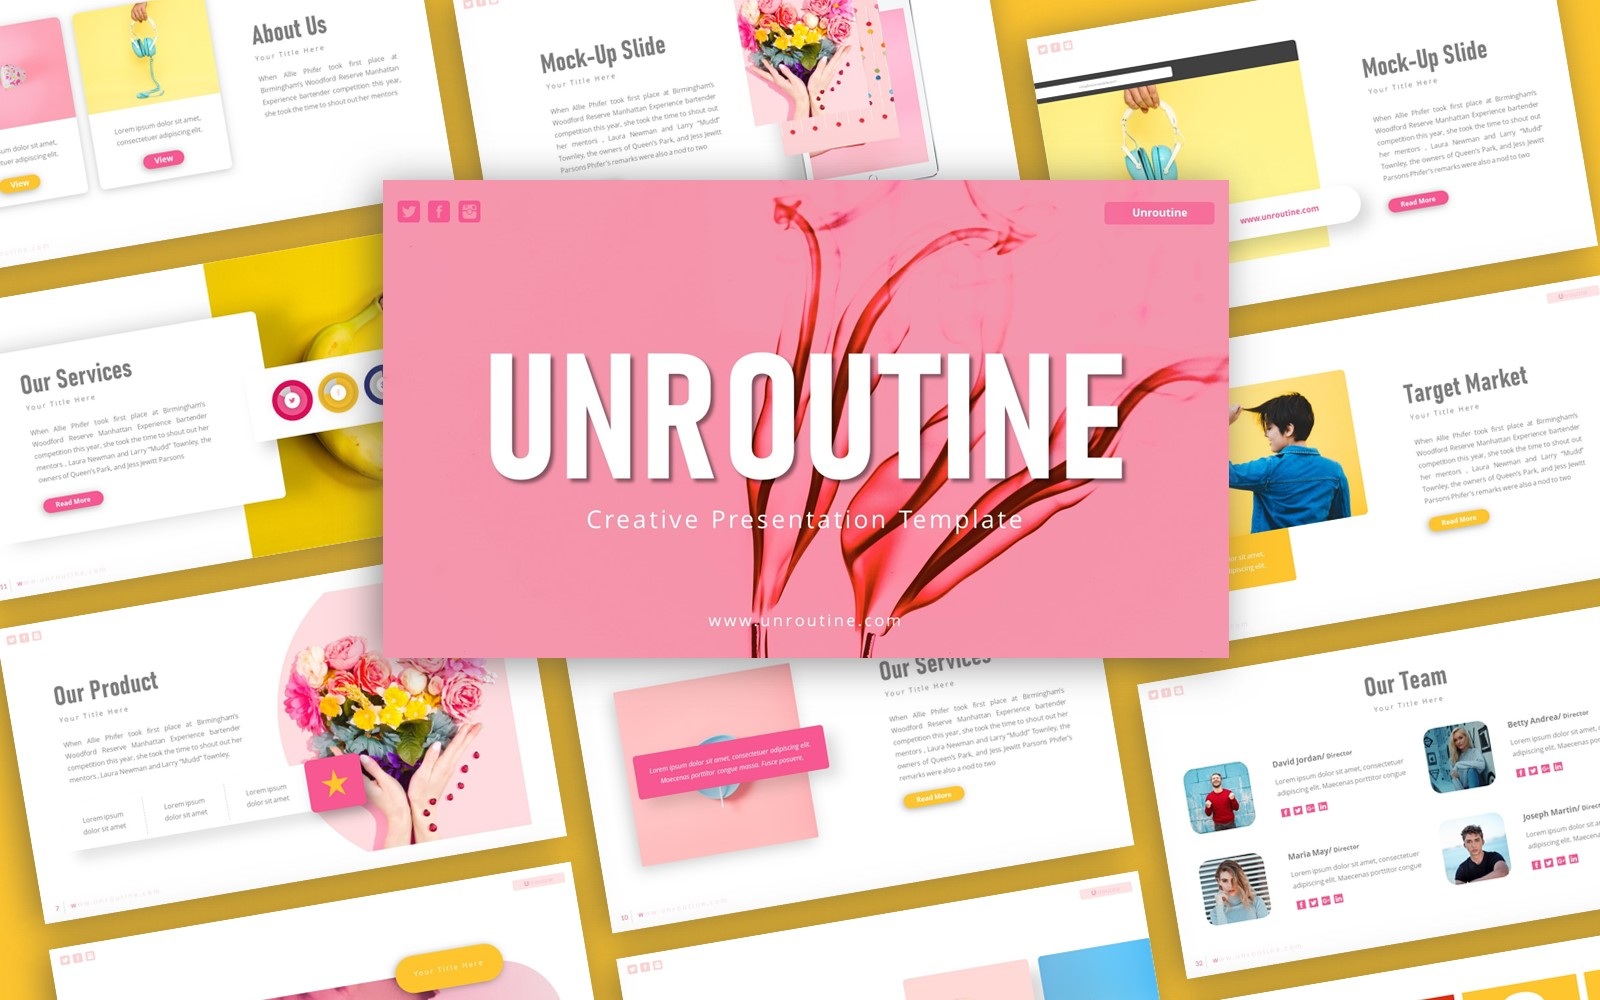 Unroutine Creative Presentation PowerPoint Template